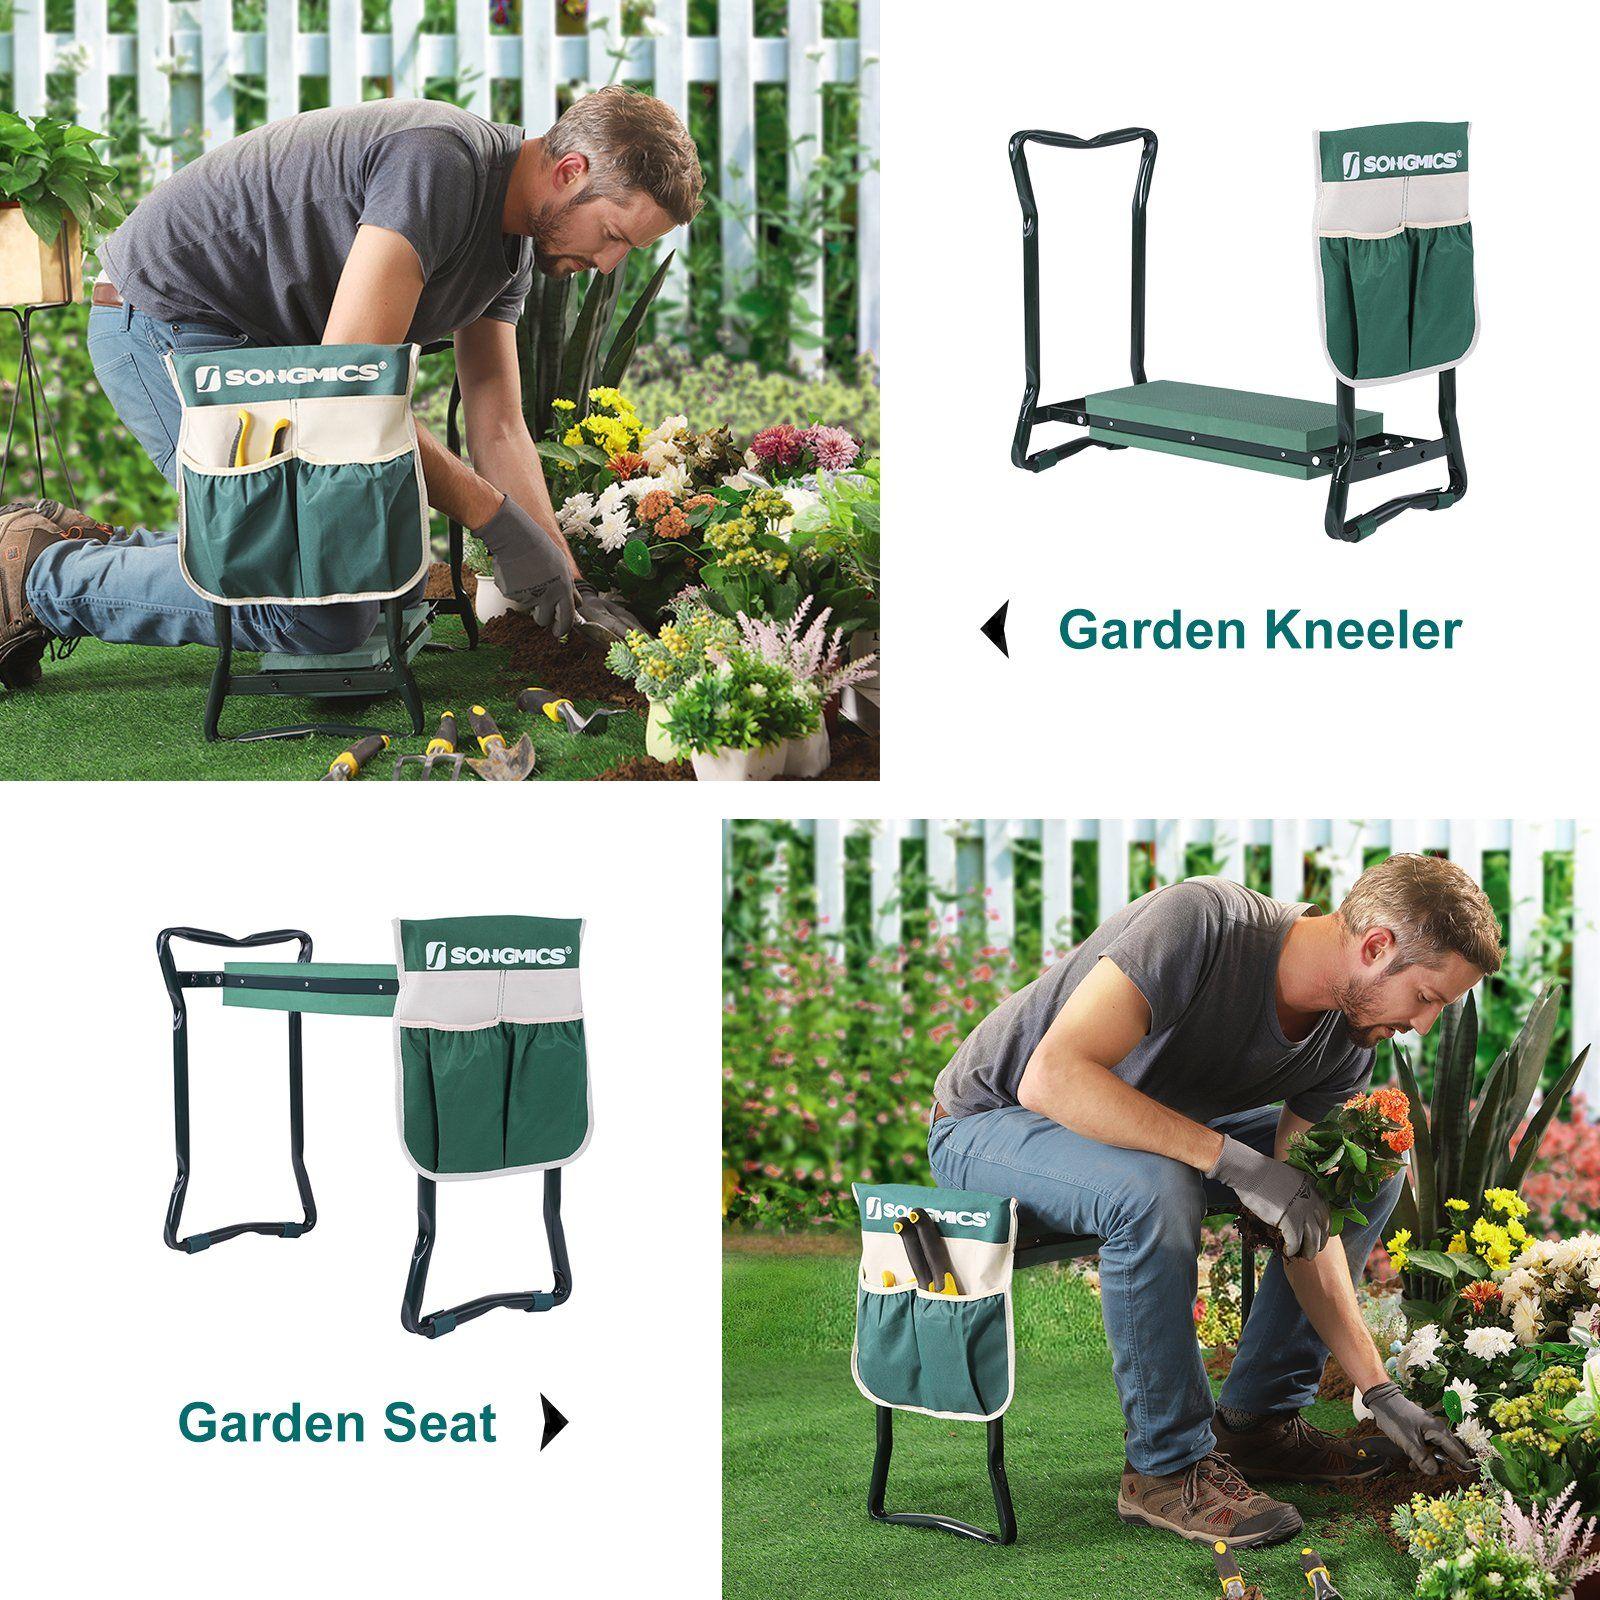 Songmics Folding Garden Kneeler Folding Bench Stool With Kneeling